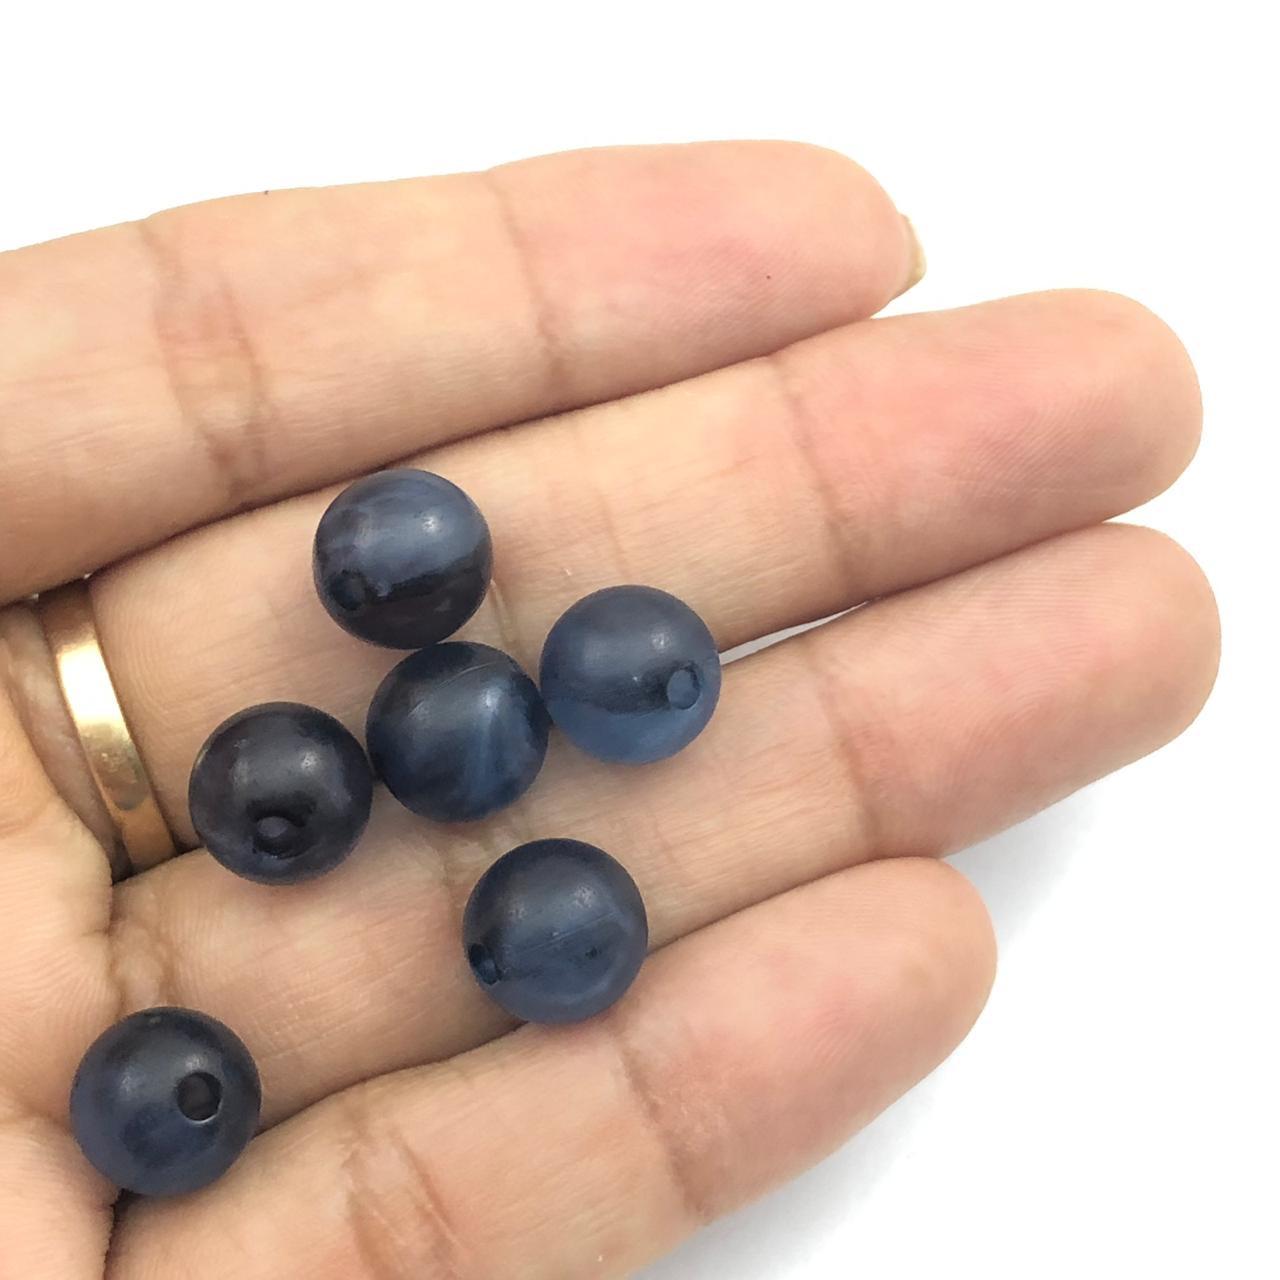 BOL248 - Bola Resina Azul Glaciada 10mm - 20Grs